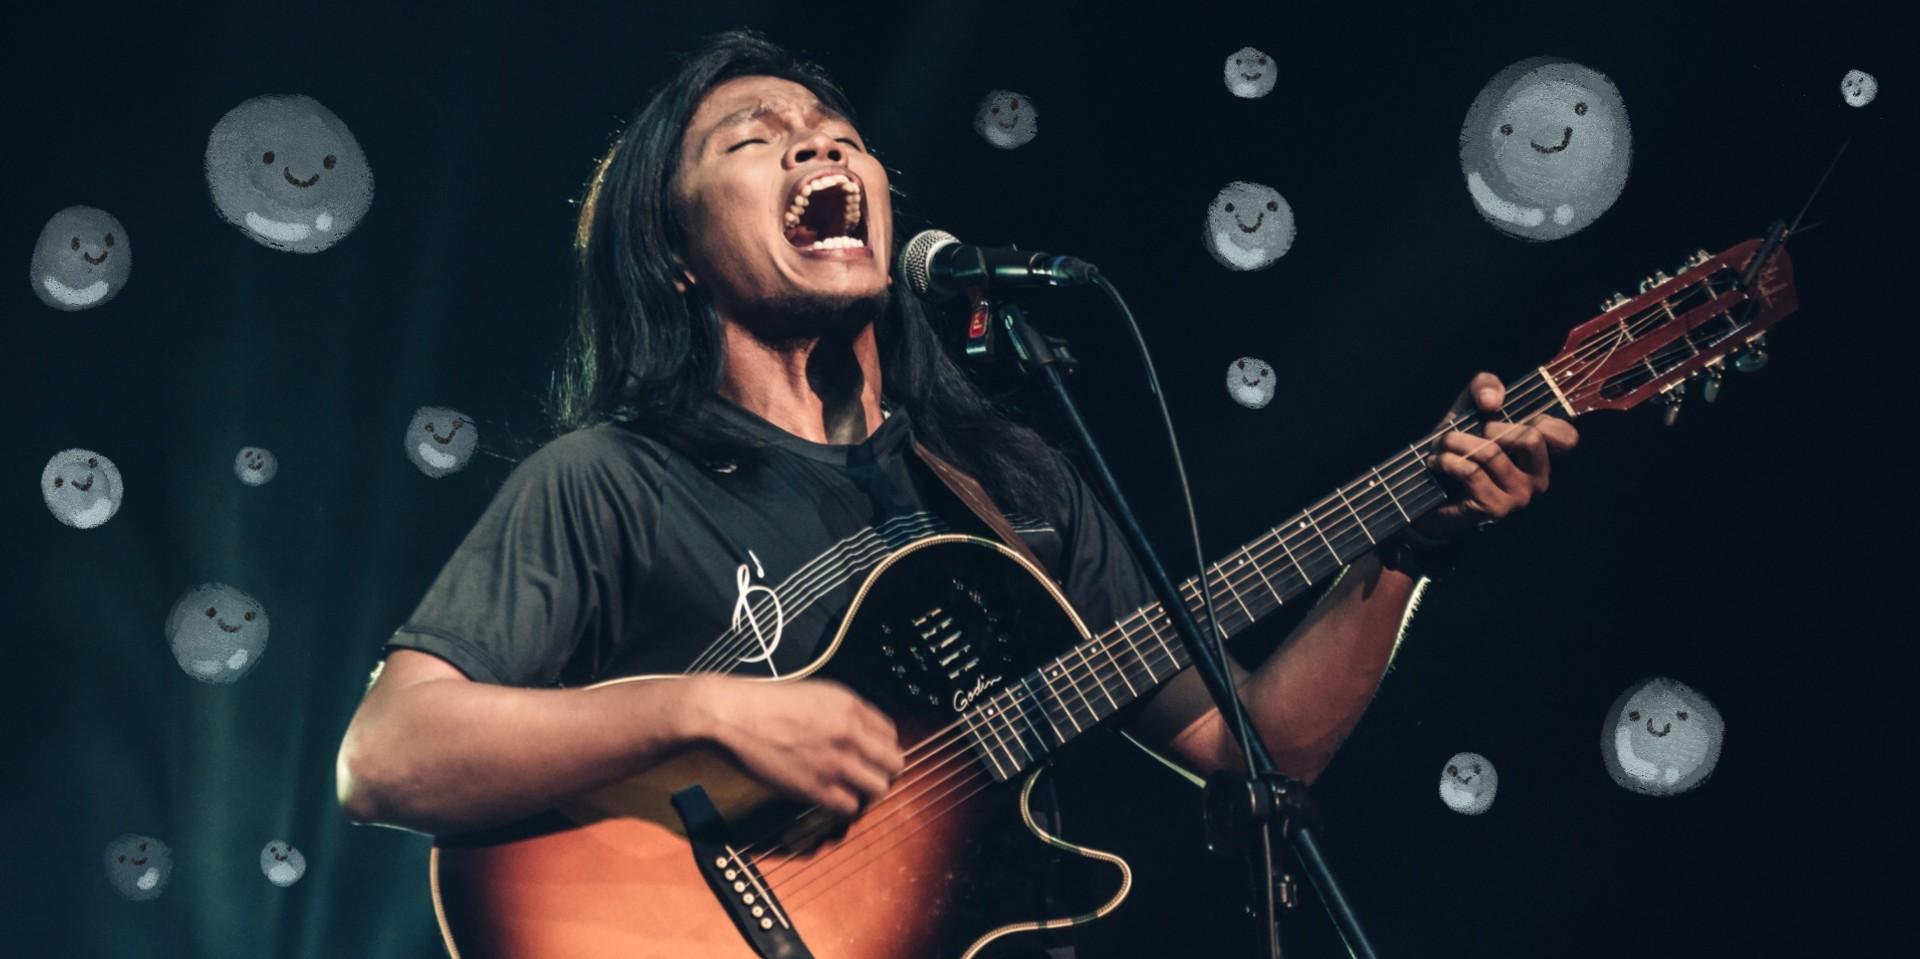 Bullet Dumas shares playful hand-washing song 'Tara, Hugas!' to keep germs away – watch